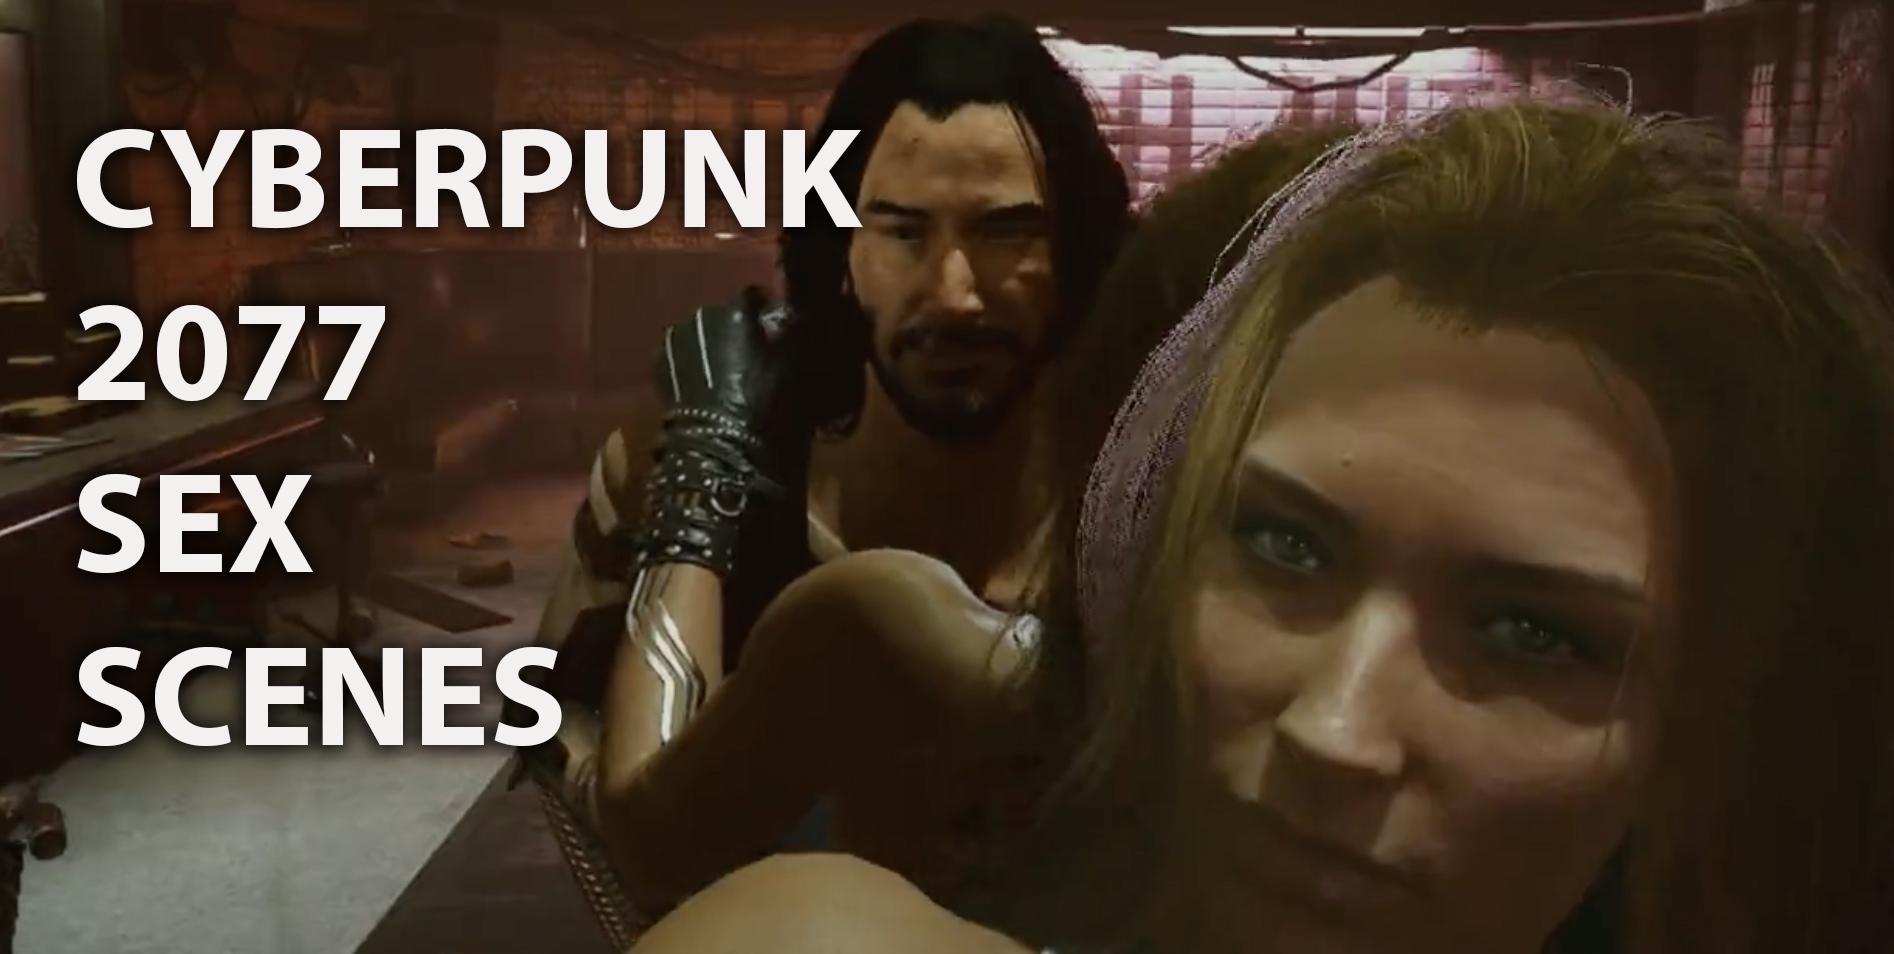 cyberpunk 2077 sex scenes feature image